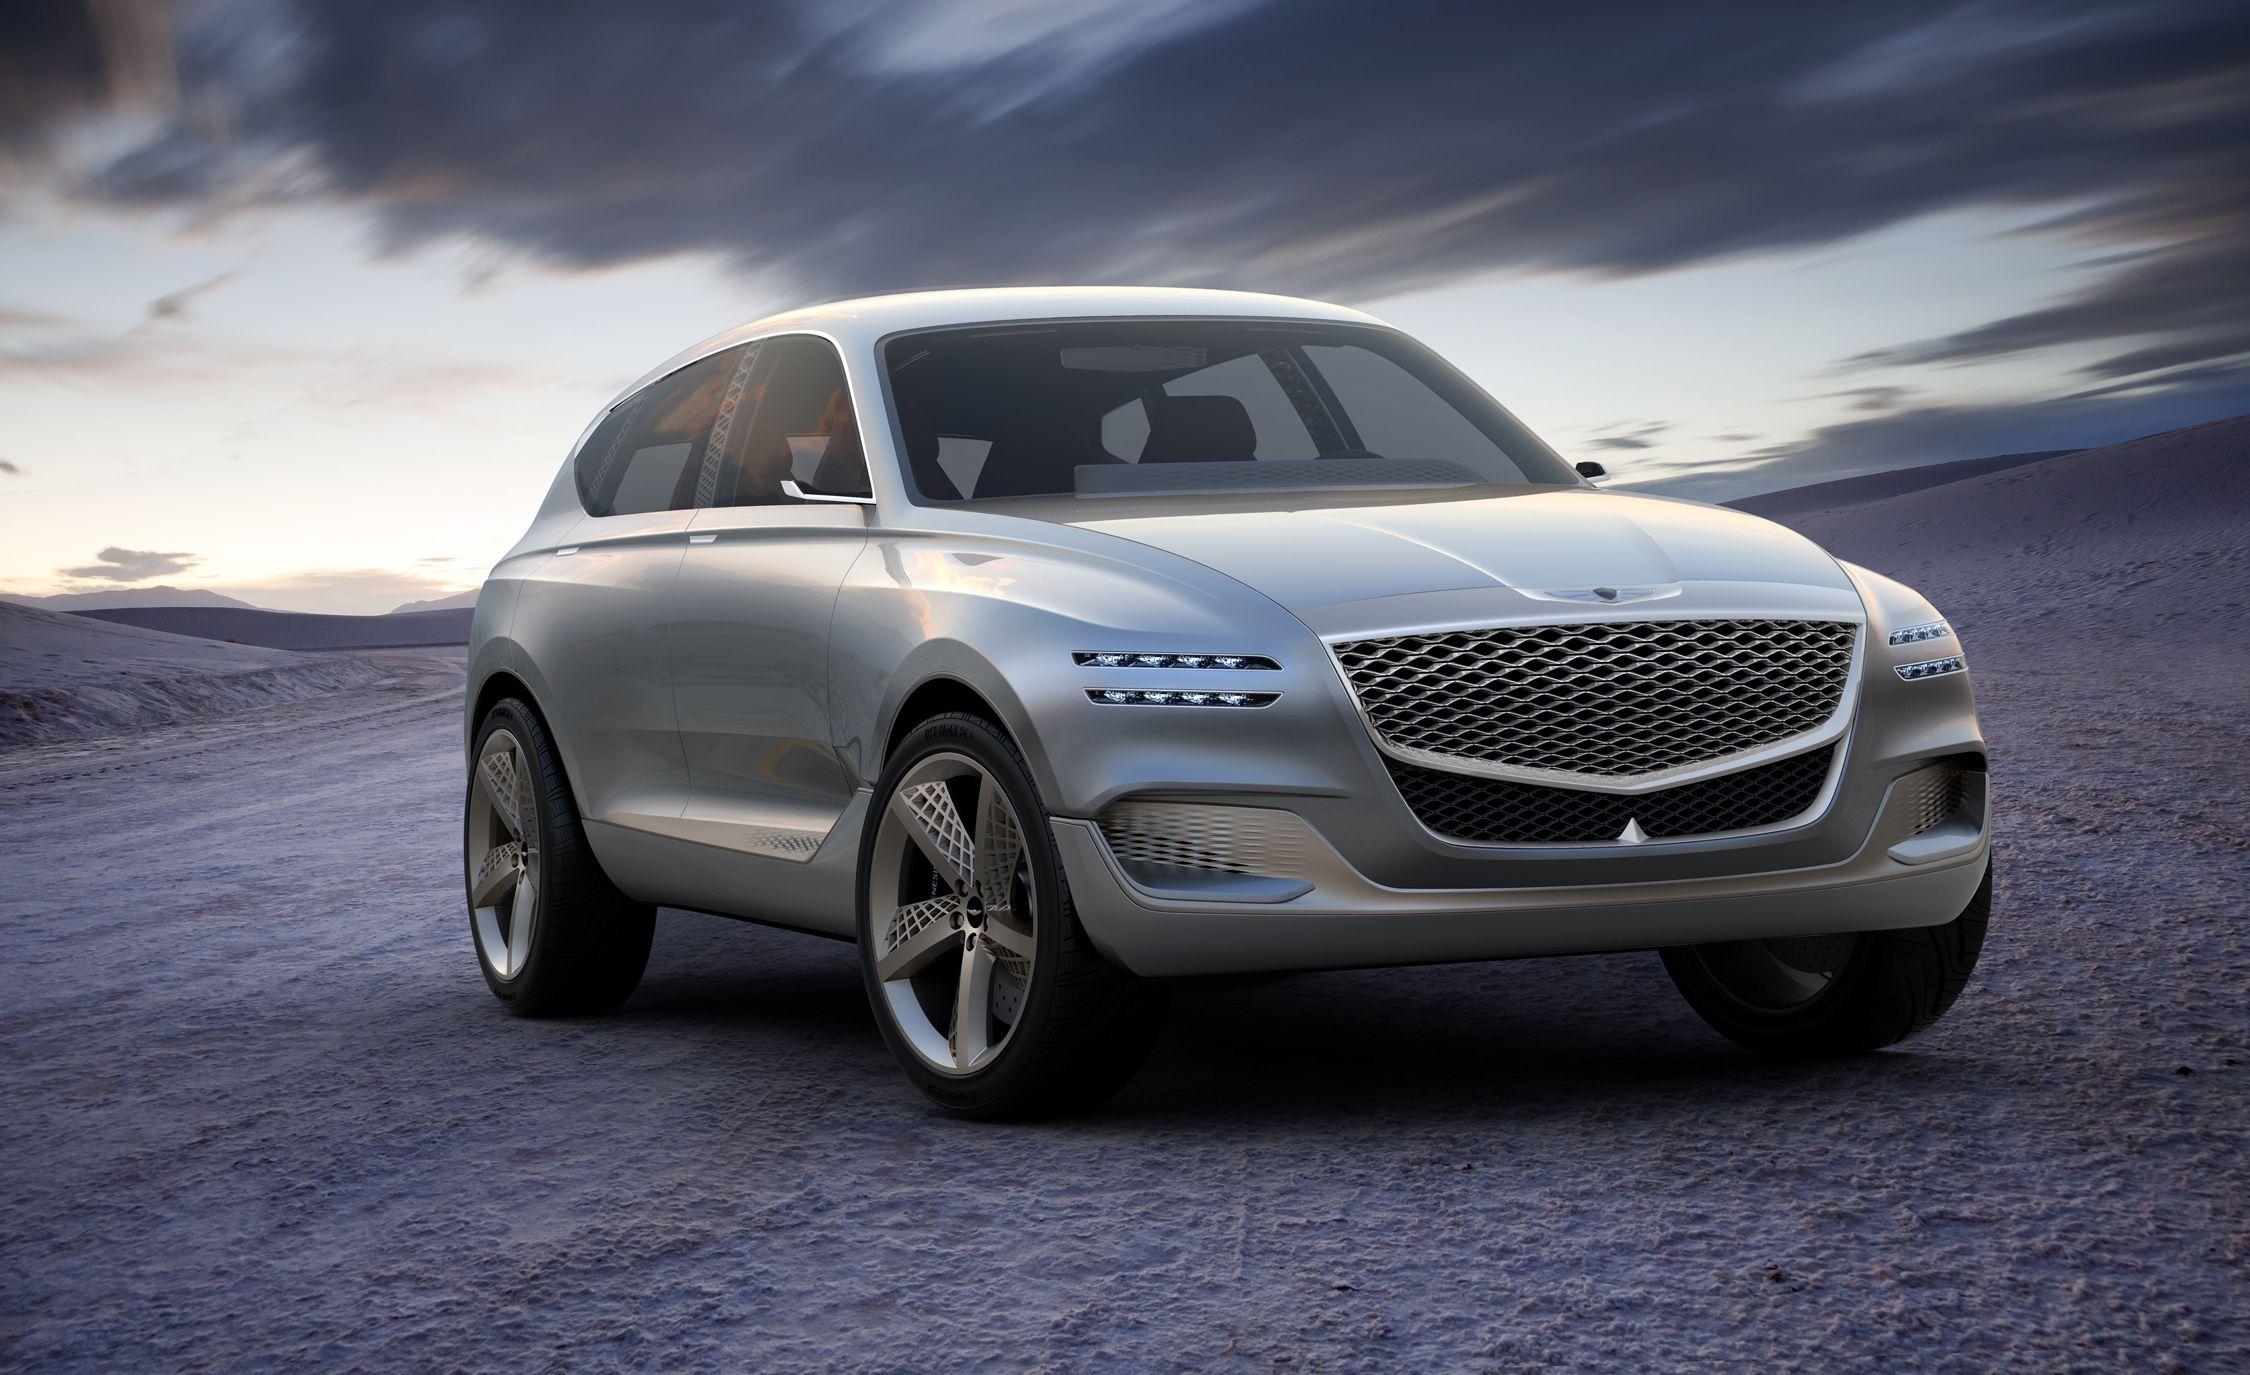 Genesis Gv80 Concept Photos And Info News Car And Driver